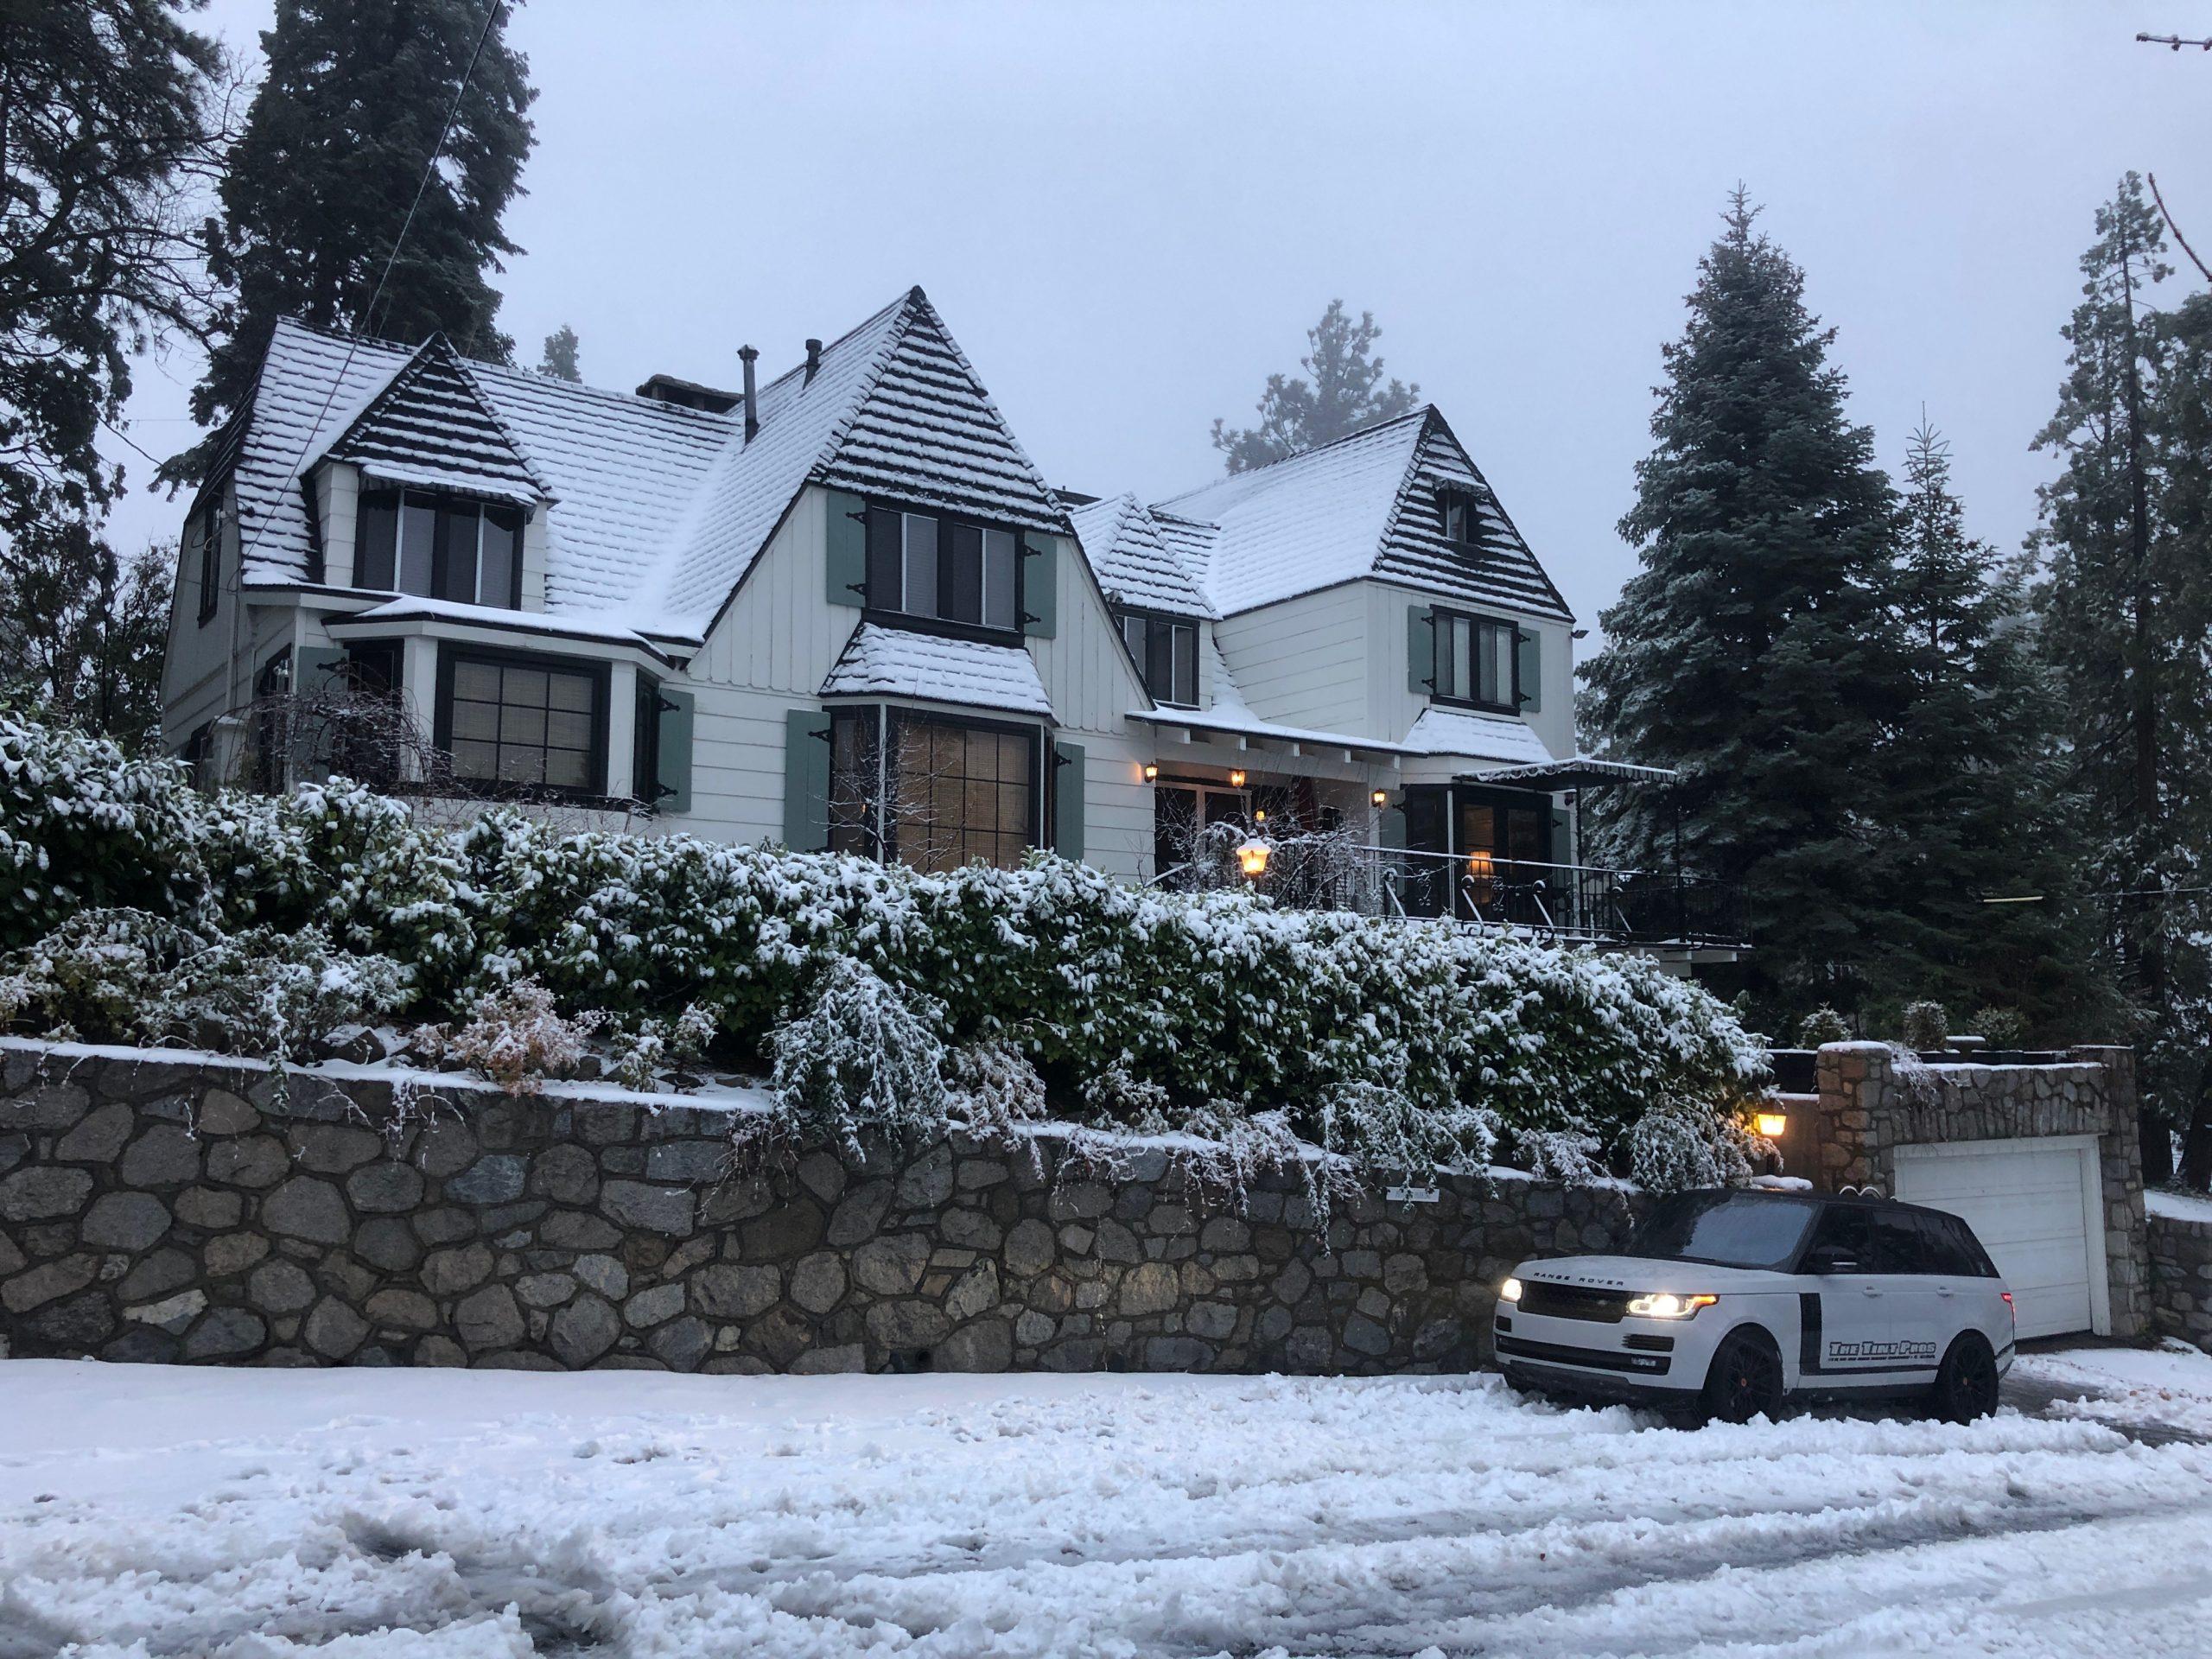 331 John Muir Rd in Lake Arrowhead